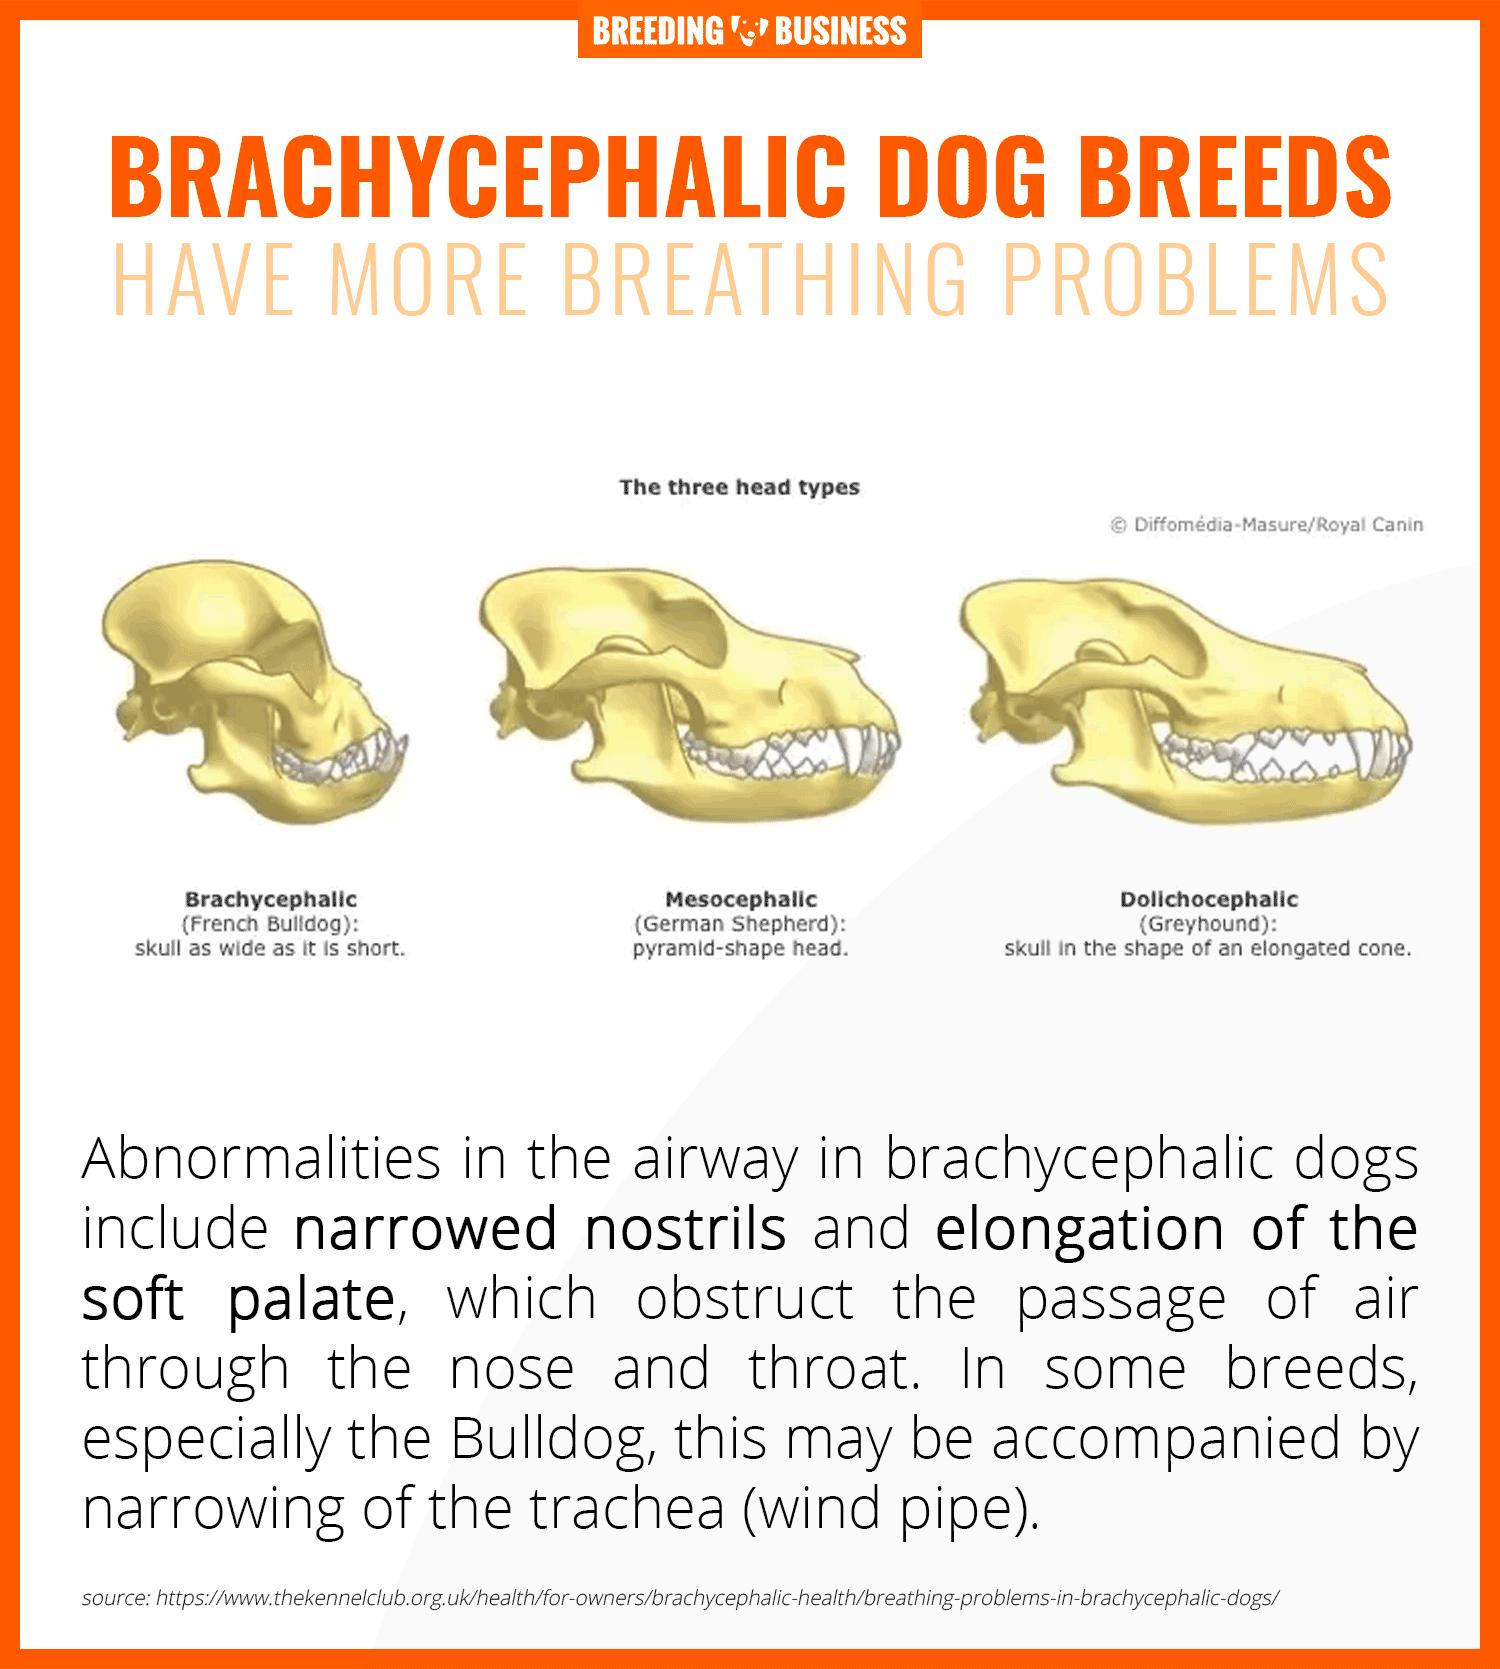 breathing problems in brachycephalic dogs